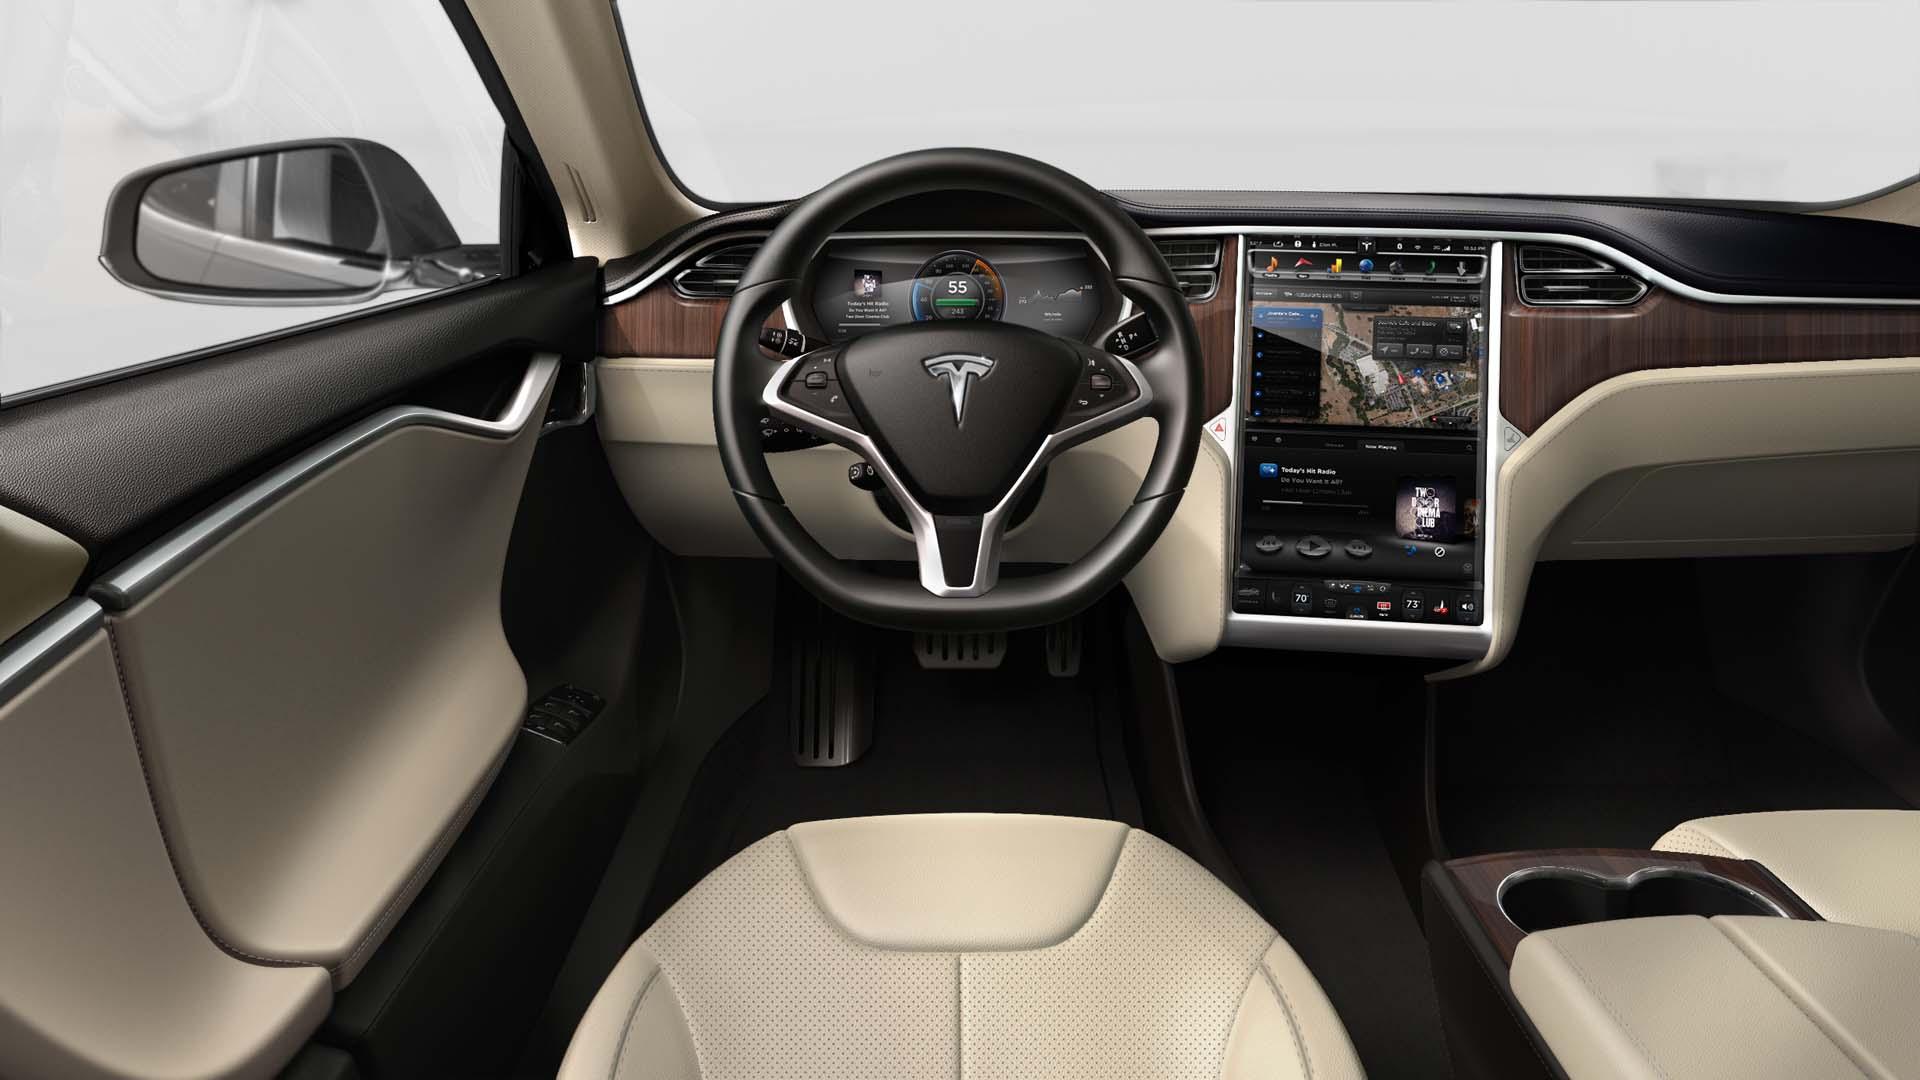 Tesla Model S X to receive spartan Model 3 interior design 1920x1080